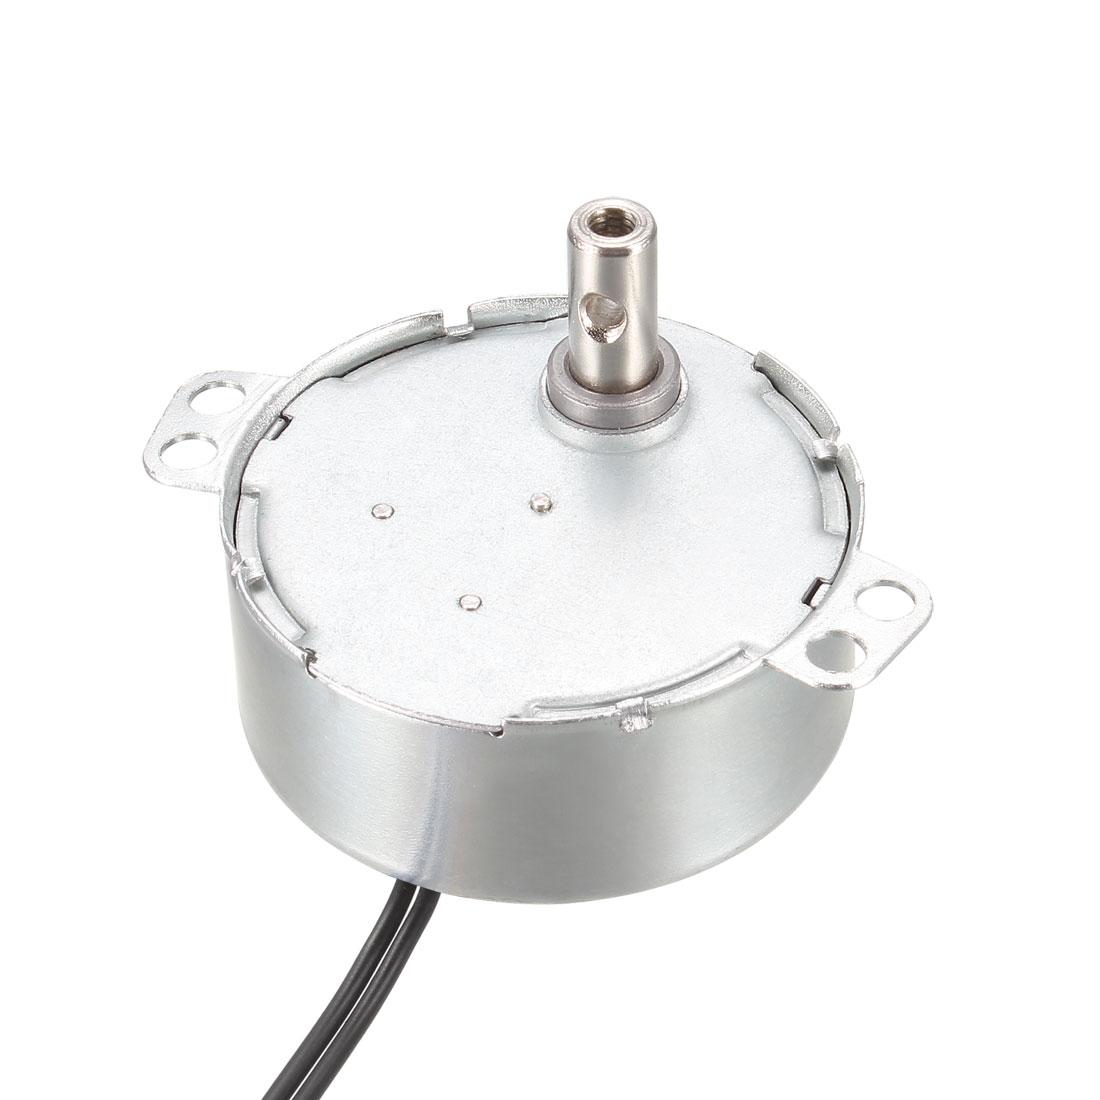 Synchronous Synchron Motor - Turntable Motor 220-240 VAC 50-60Hz CW 4W 20-24RPM